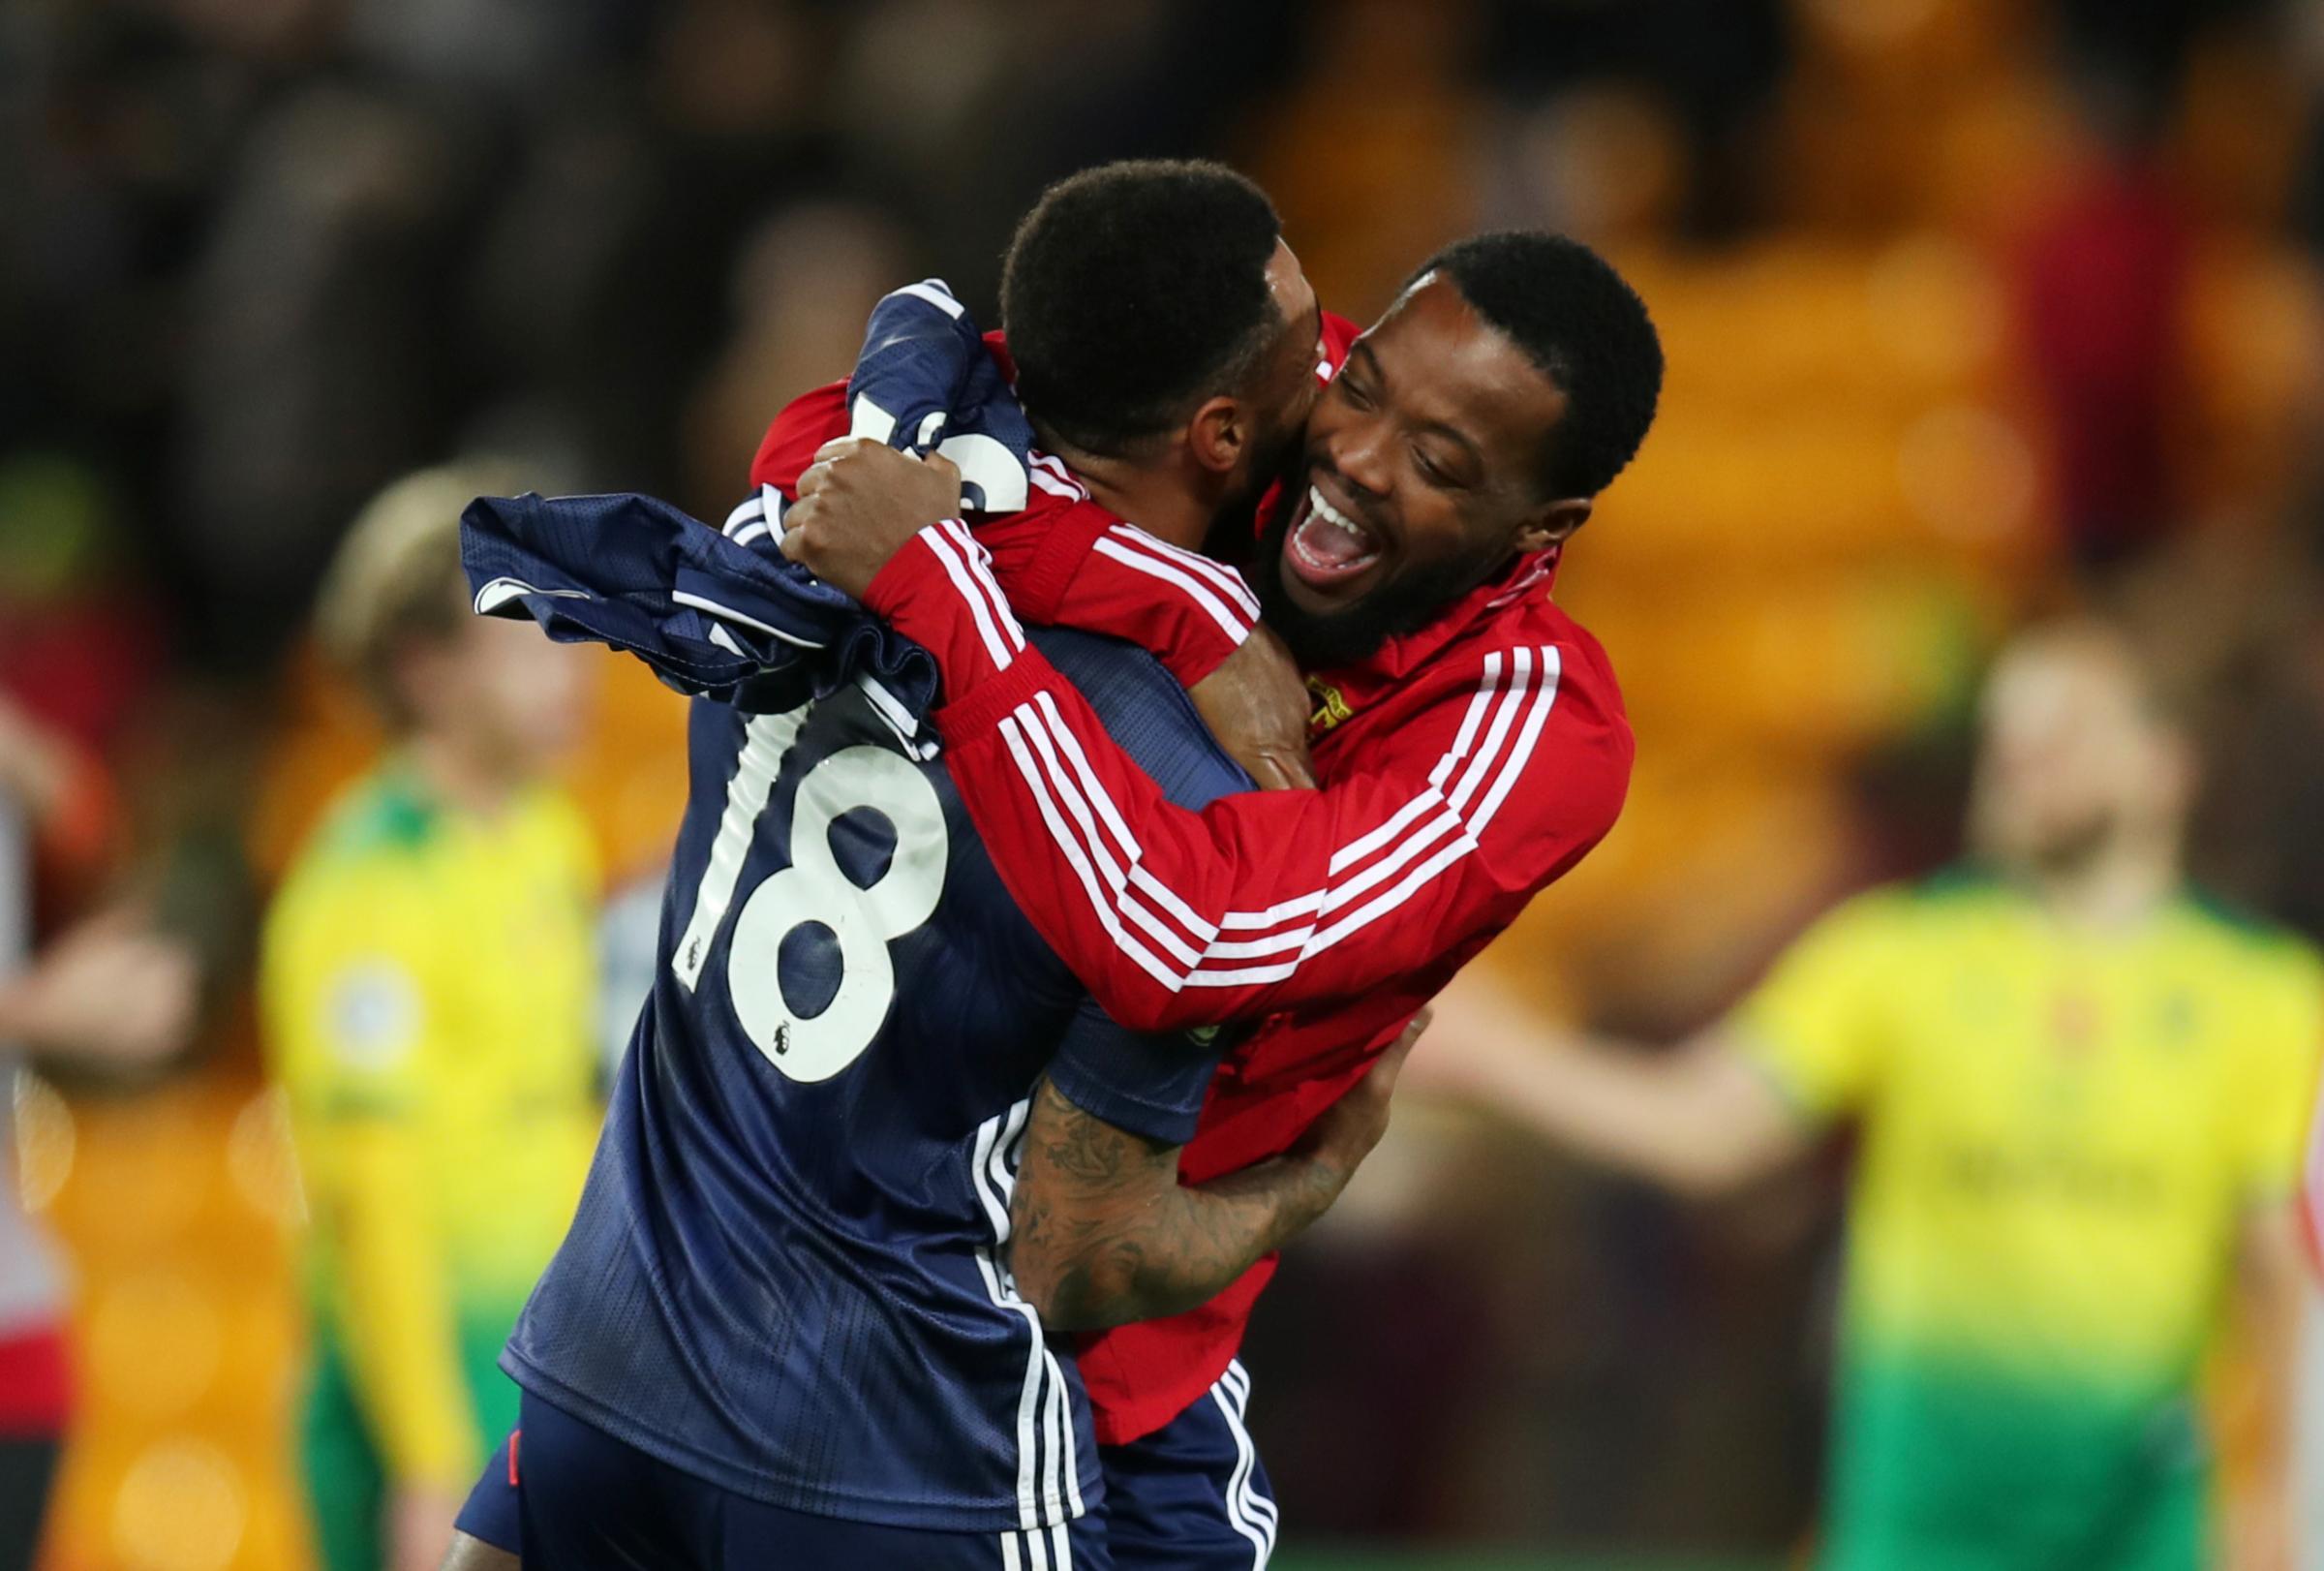 Watford beat Norwich City to move off Premier League basement